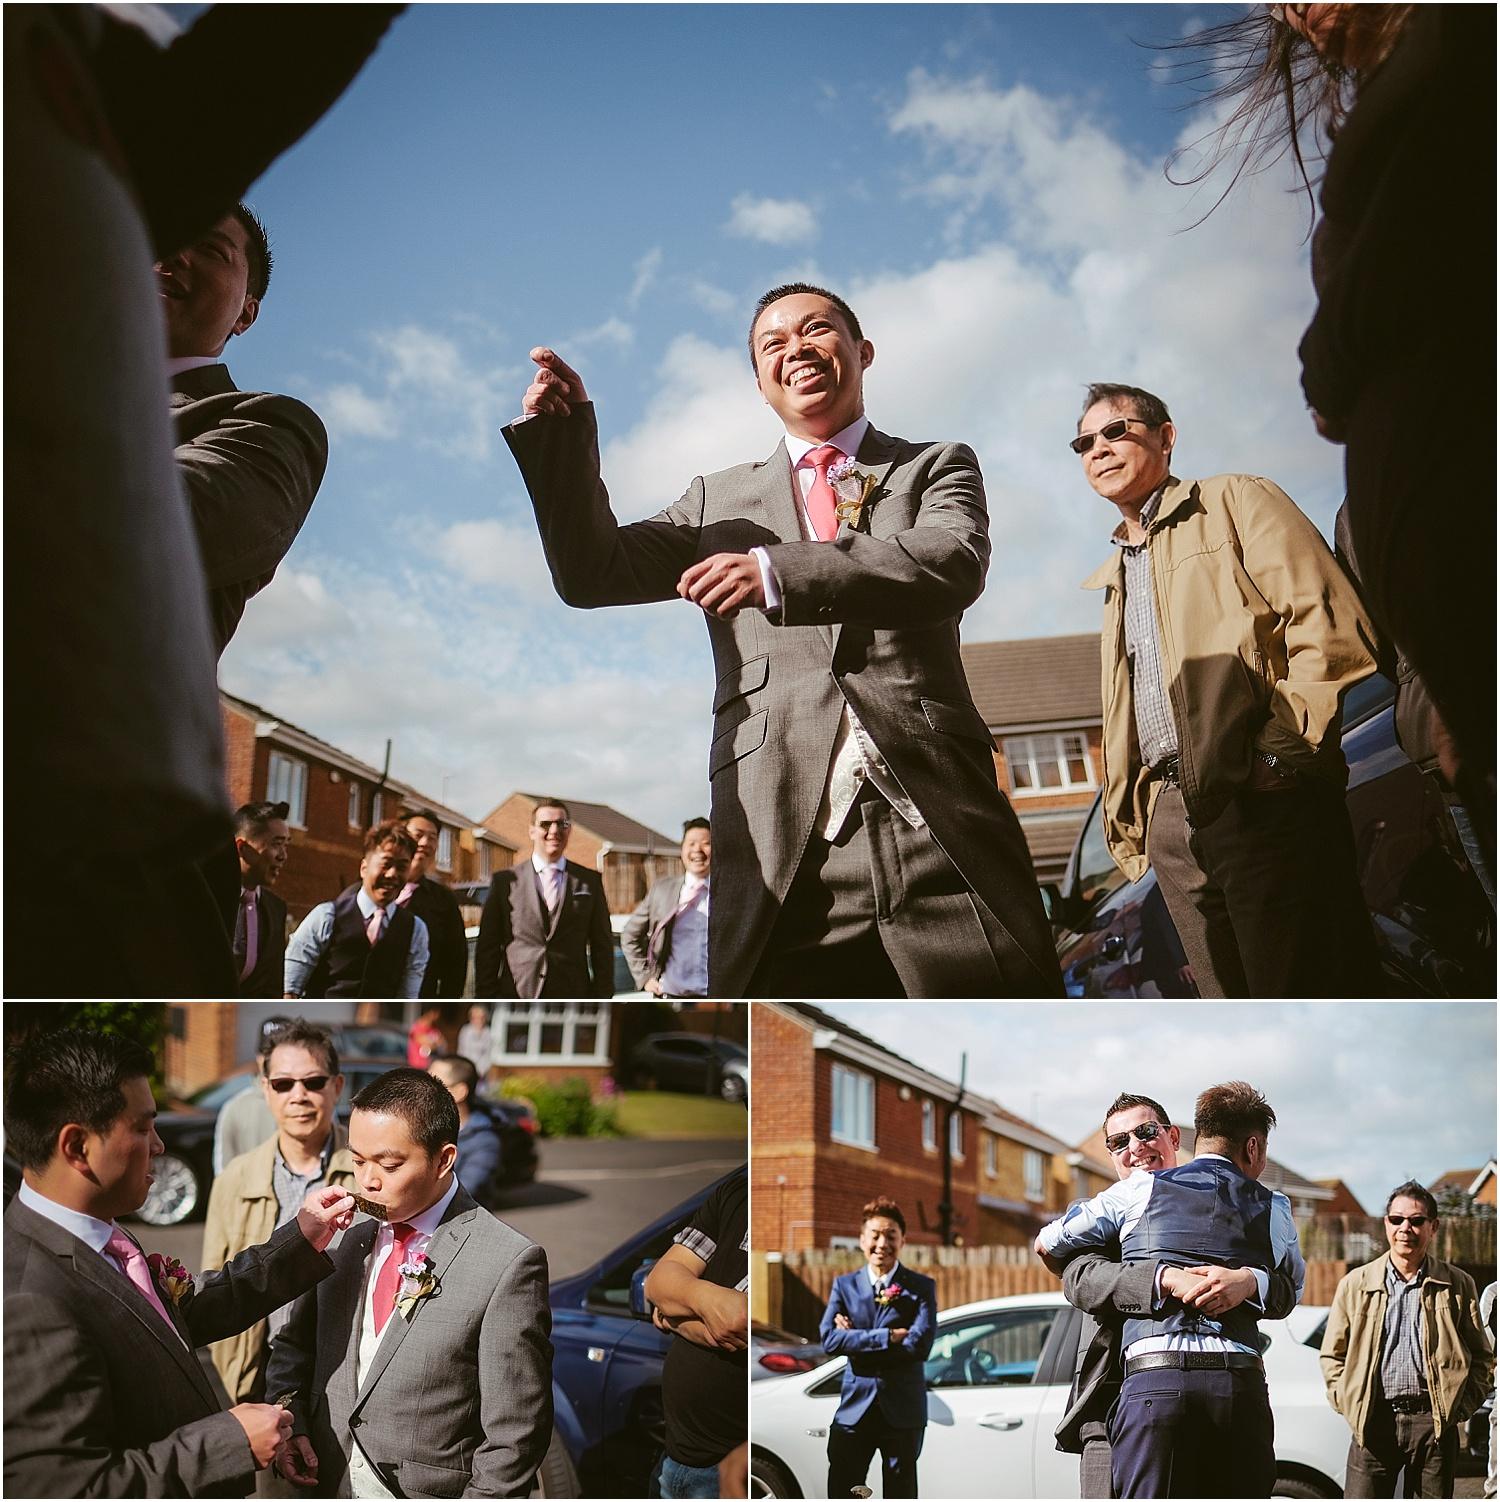 Matfen Hall wedding photography photography by www.2tonephotography.co.uk 005.jpg